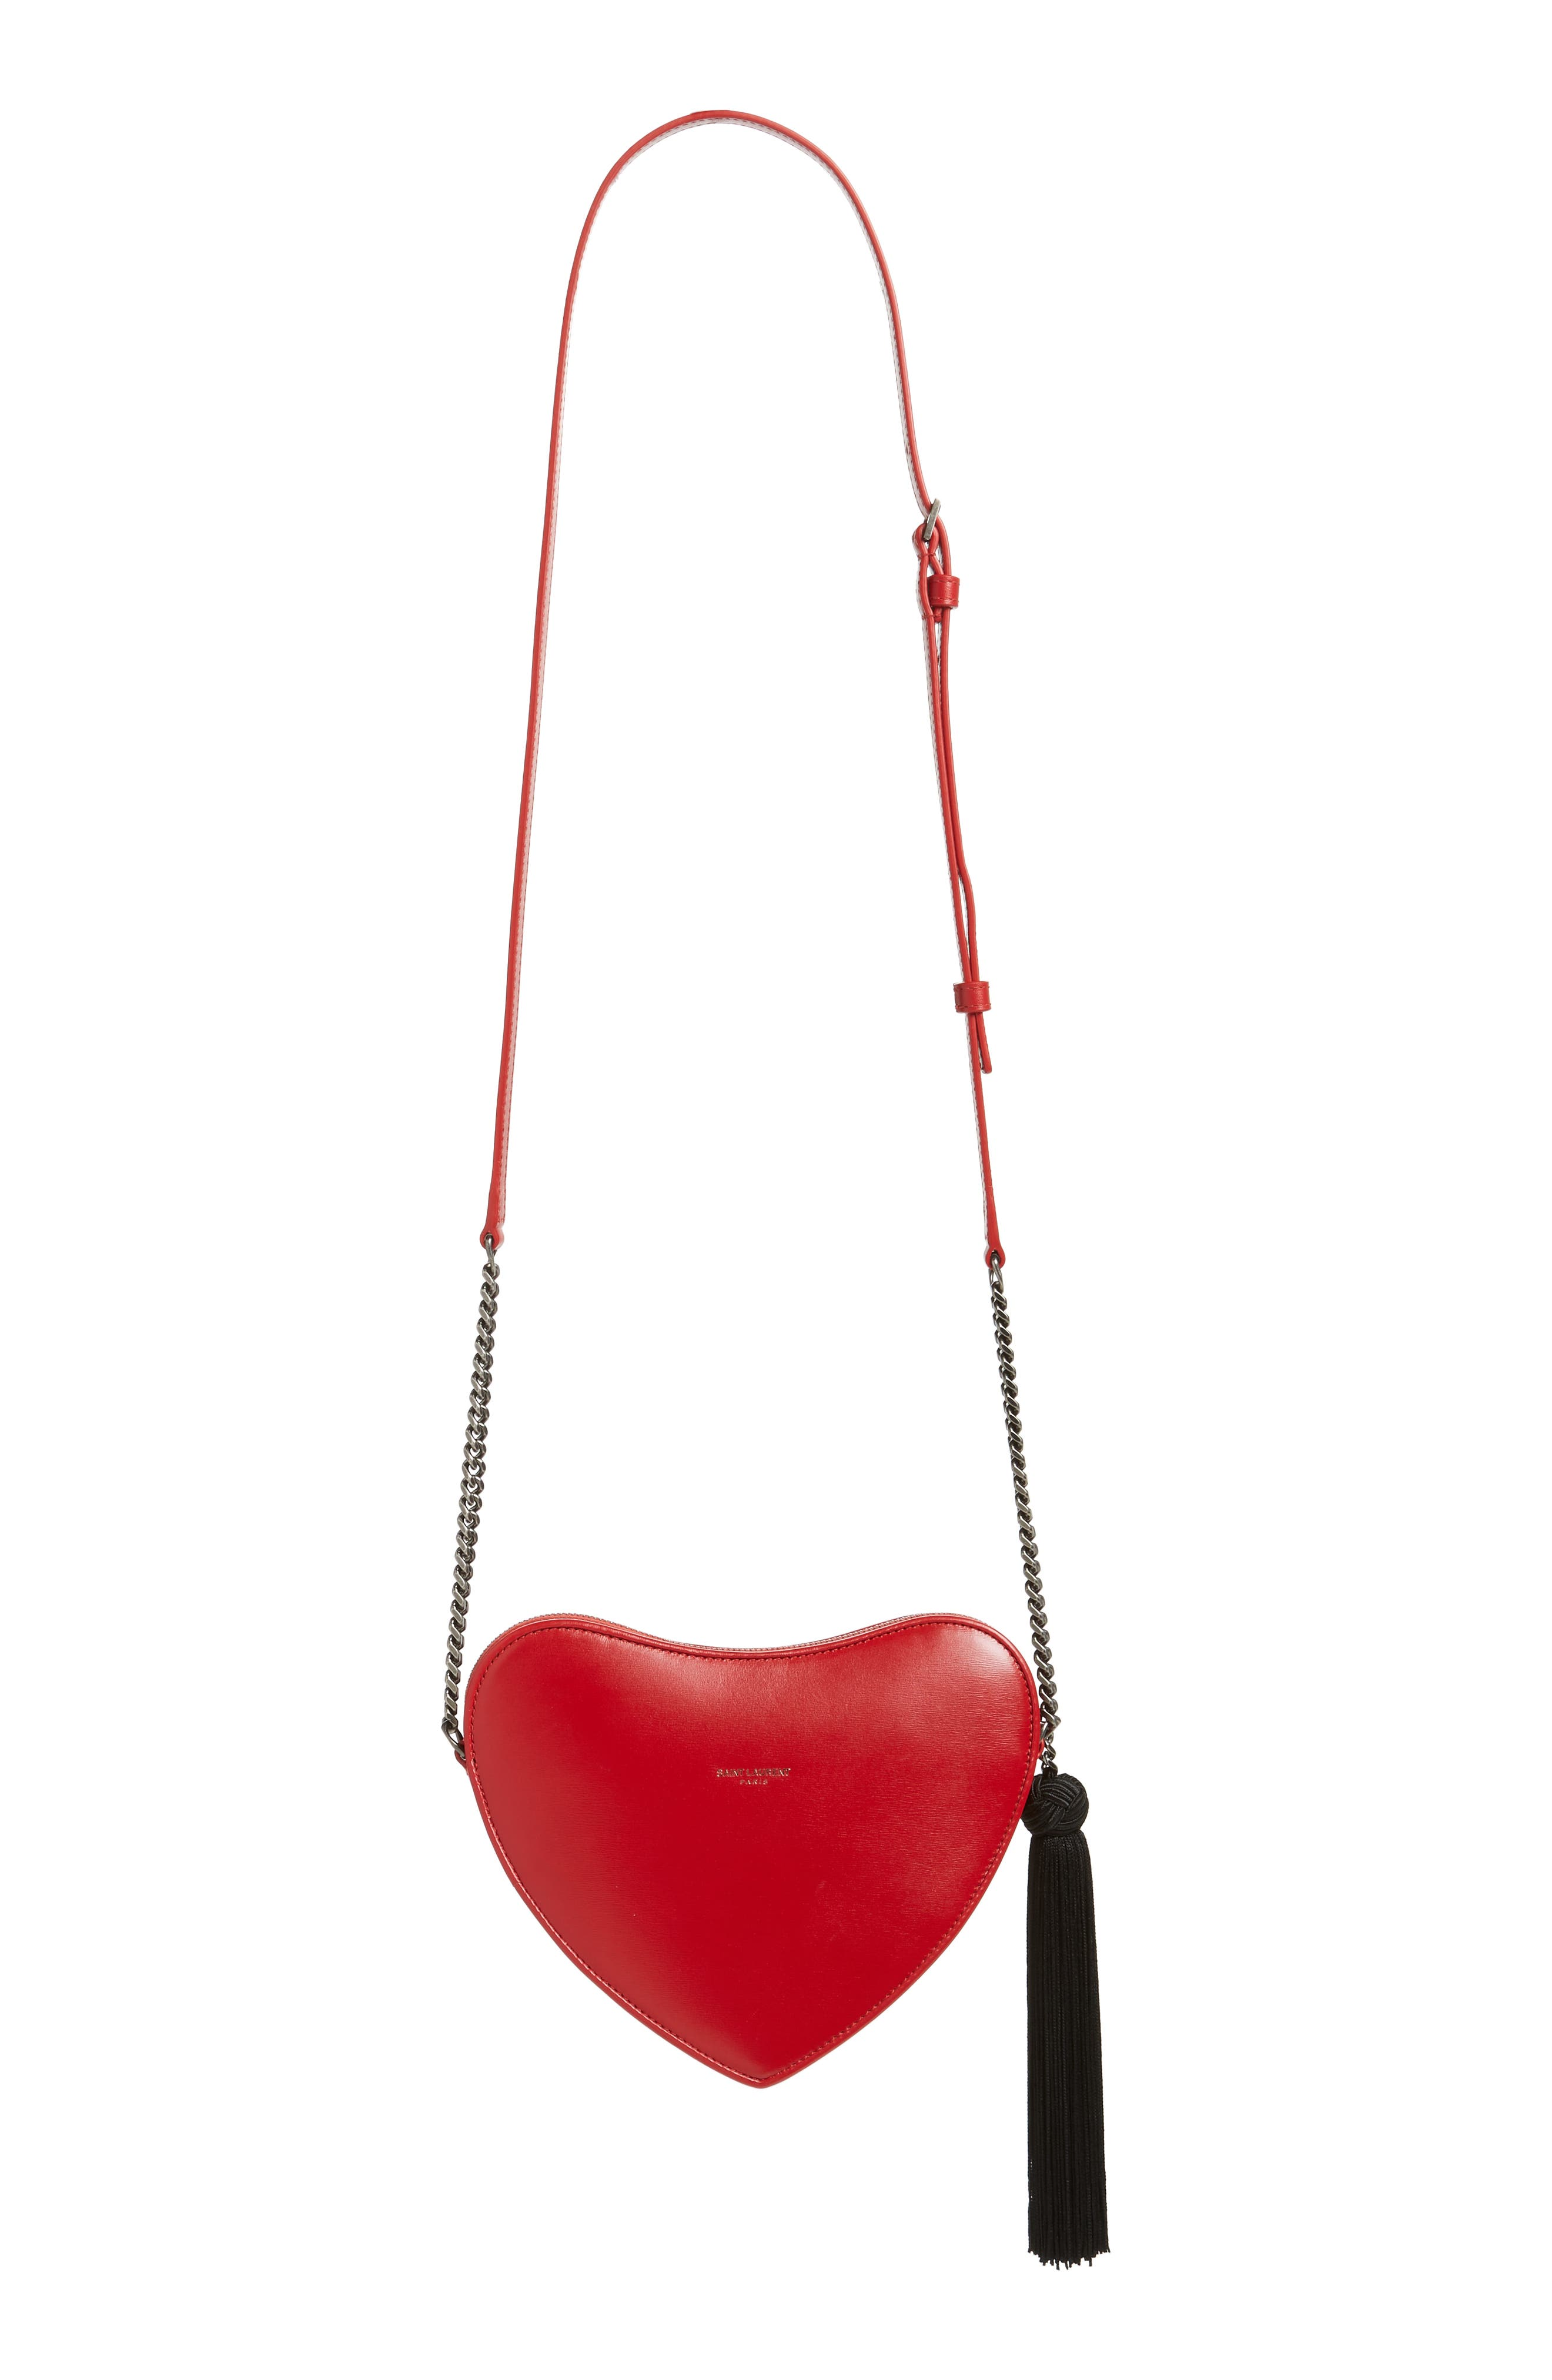 Sac Coeur Leather Crossbody Bag,                             Alternate thumbnail 3, color,                             BANDANA RED/ NOIR